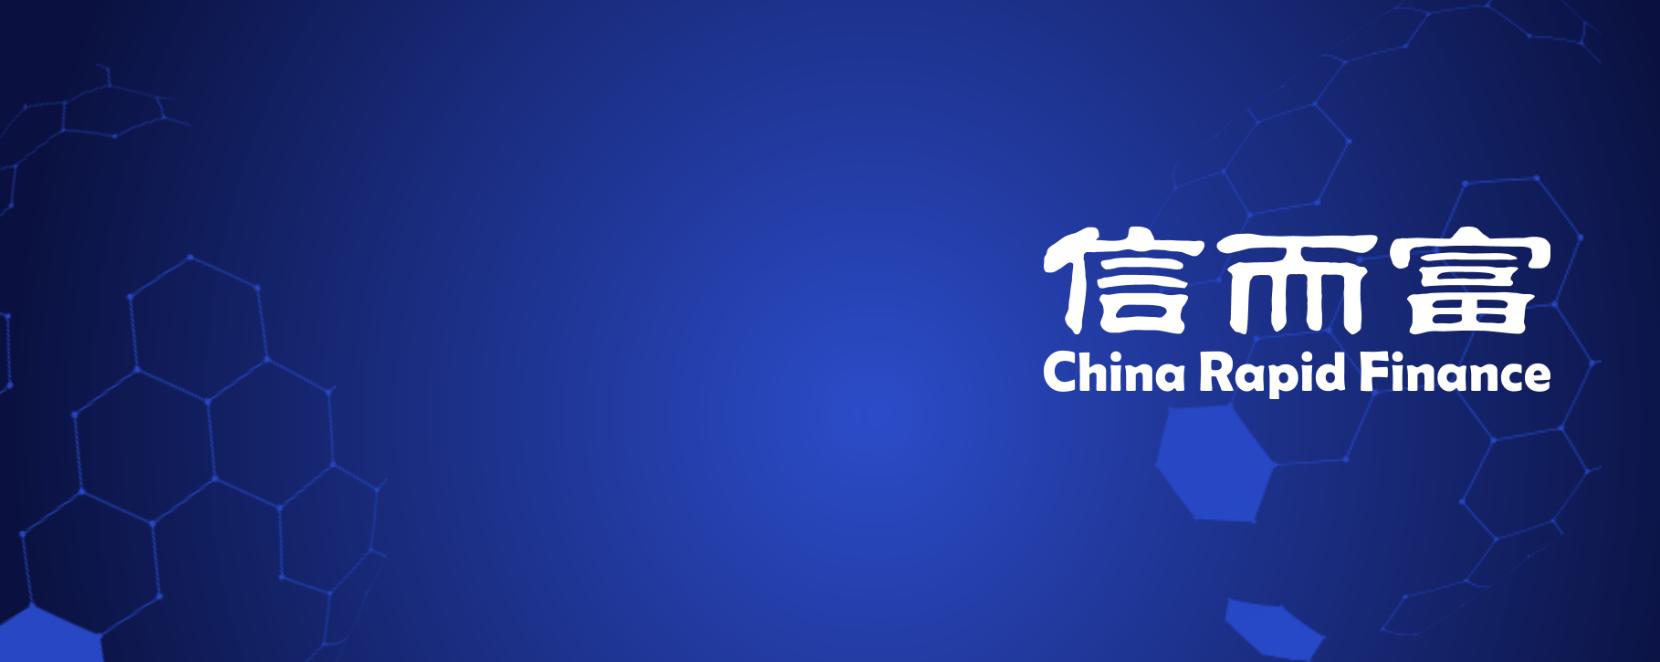 China Rapid Finance的业务转型计划<br>已获纽交所批准